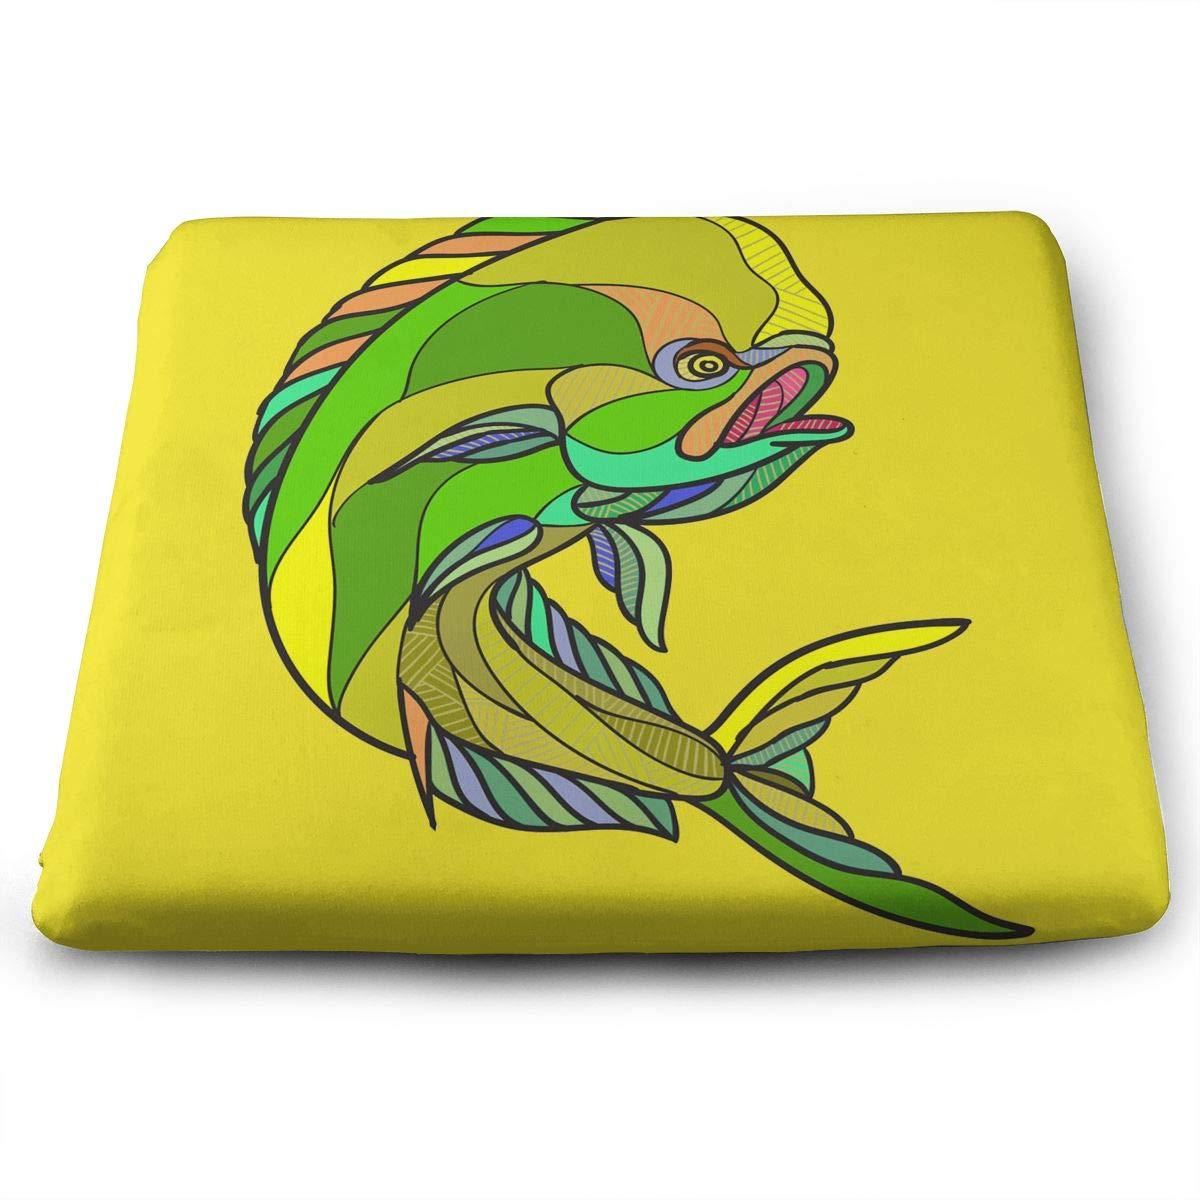 Amazon.com: Mahi-Mahi Dorado Dolphin Fish Drawing Memory ...